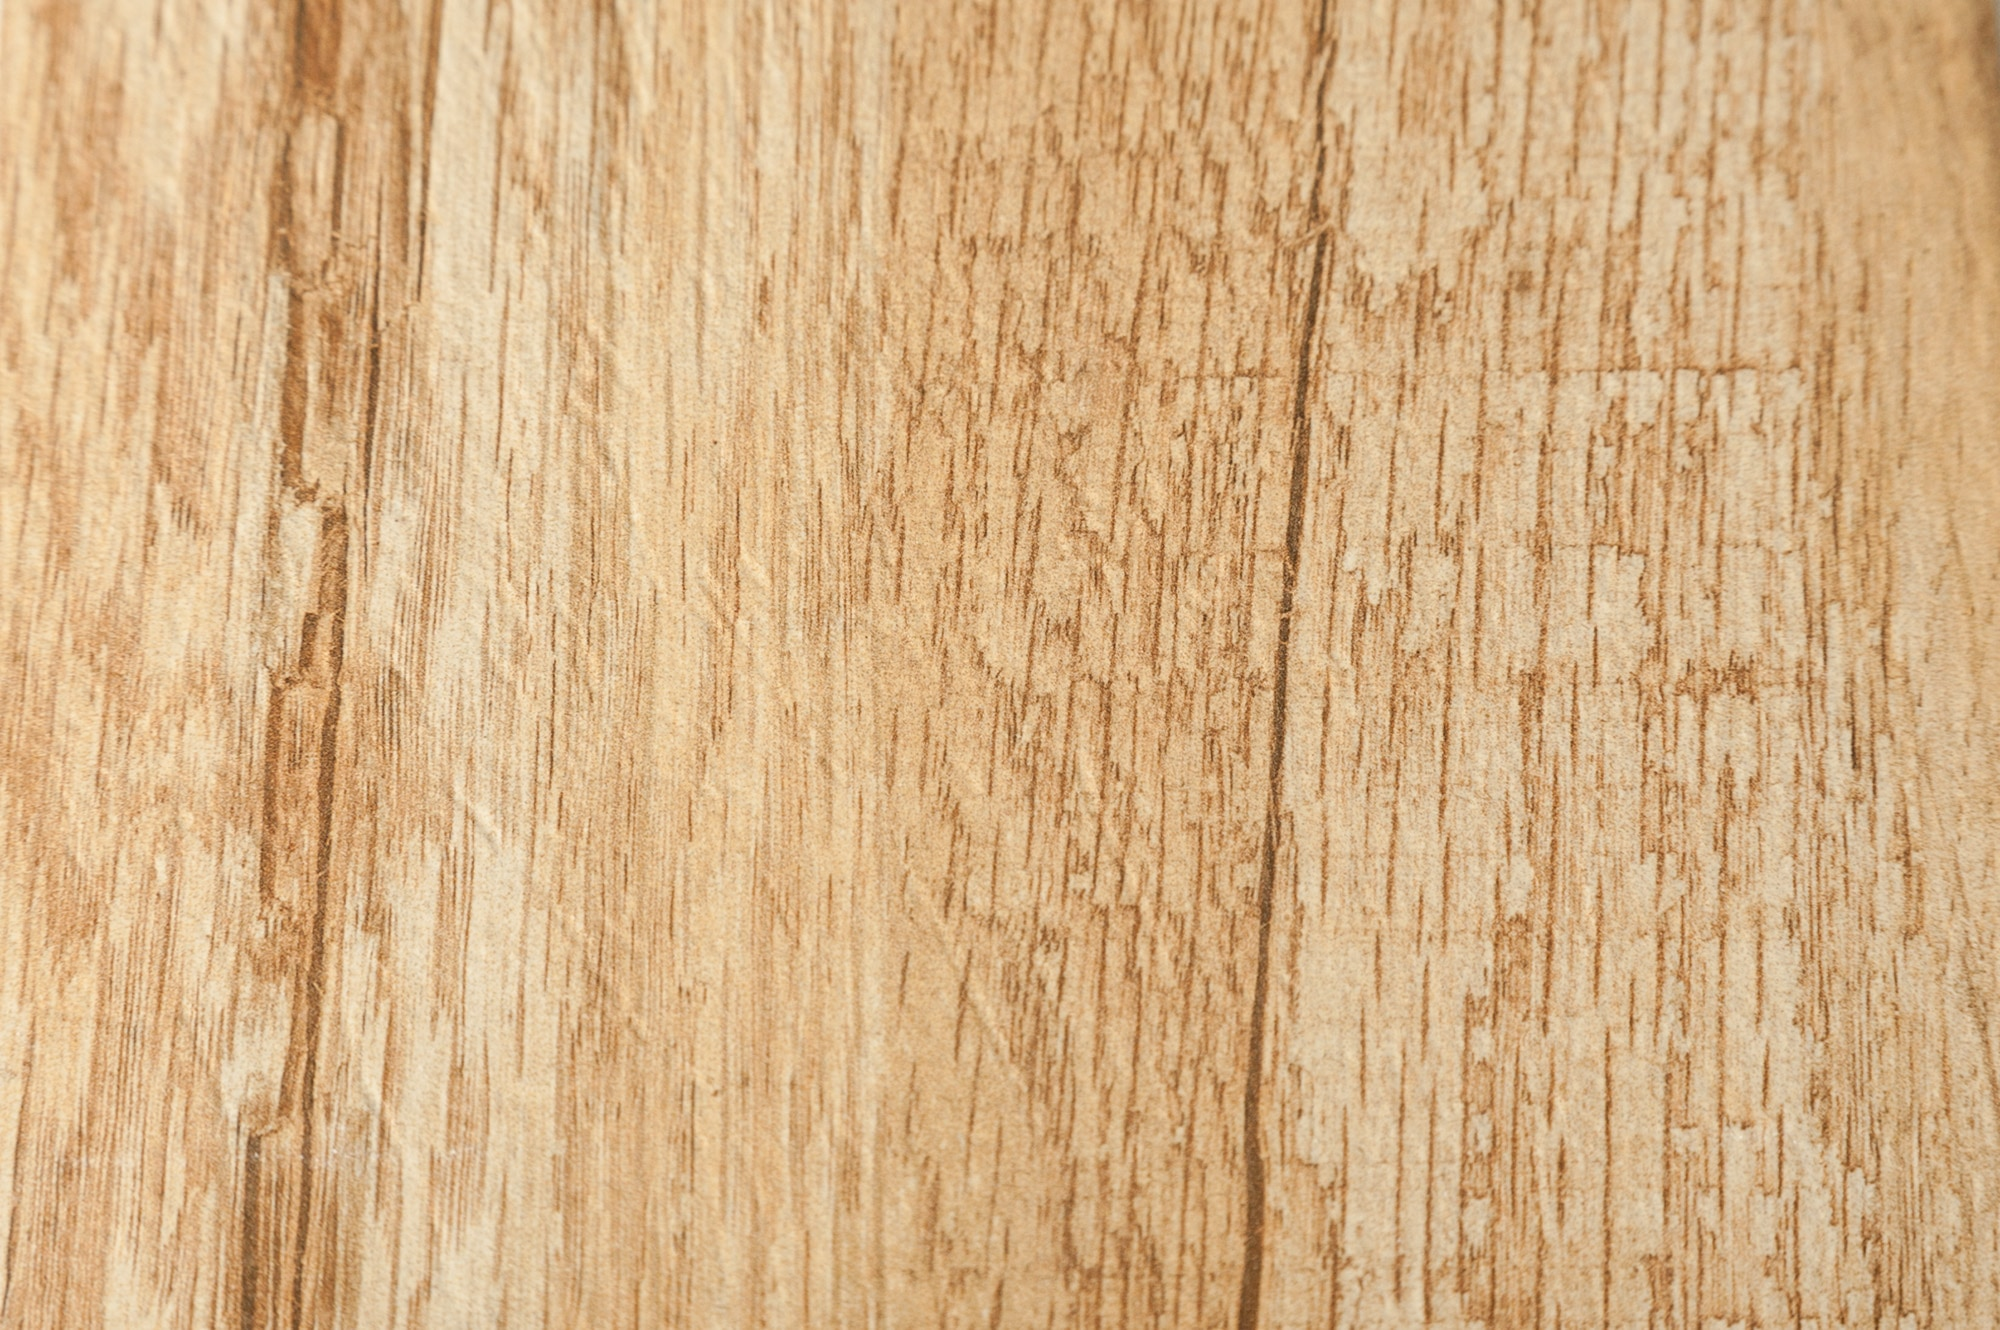 Free samples salerno ceramic tile barcelona wood series rustic free samples salerno ceramic tile barcelona wood series rustic wood 6x24 dailygadgetfo Choice Image